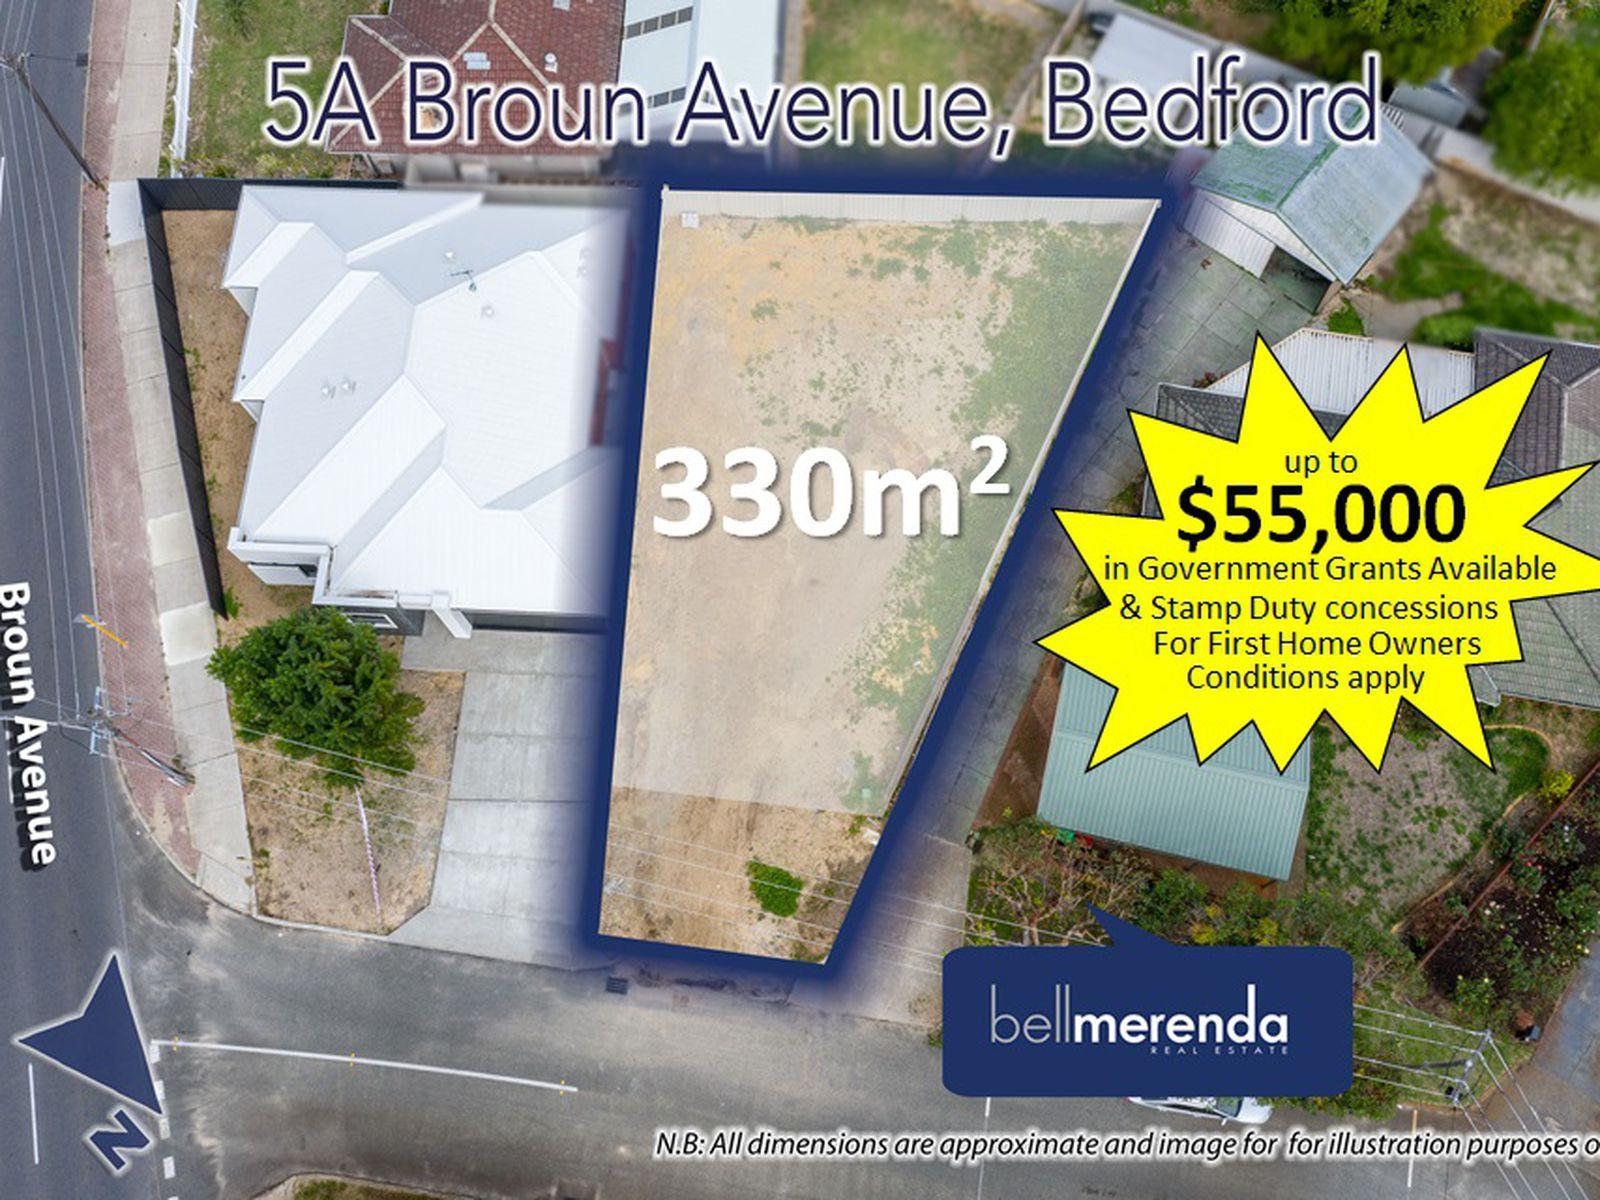 5A Broun Avenue, Bedford